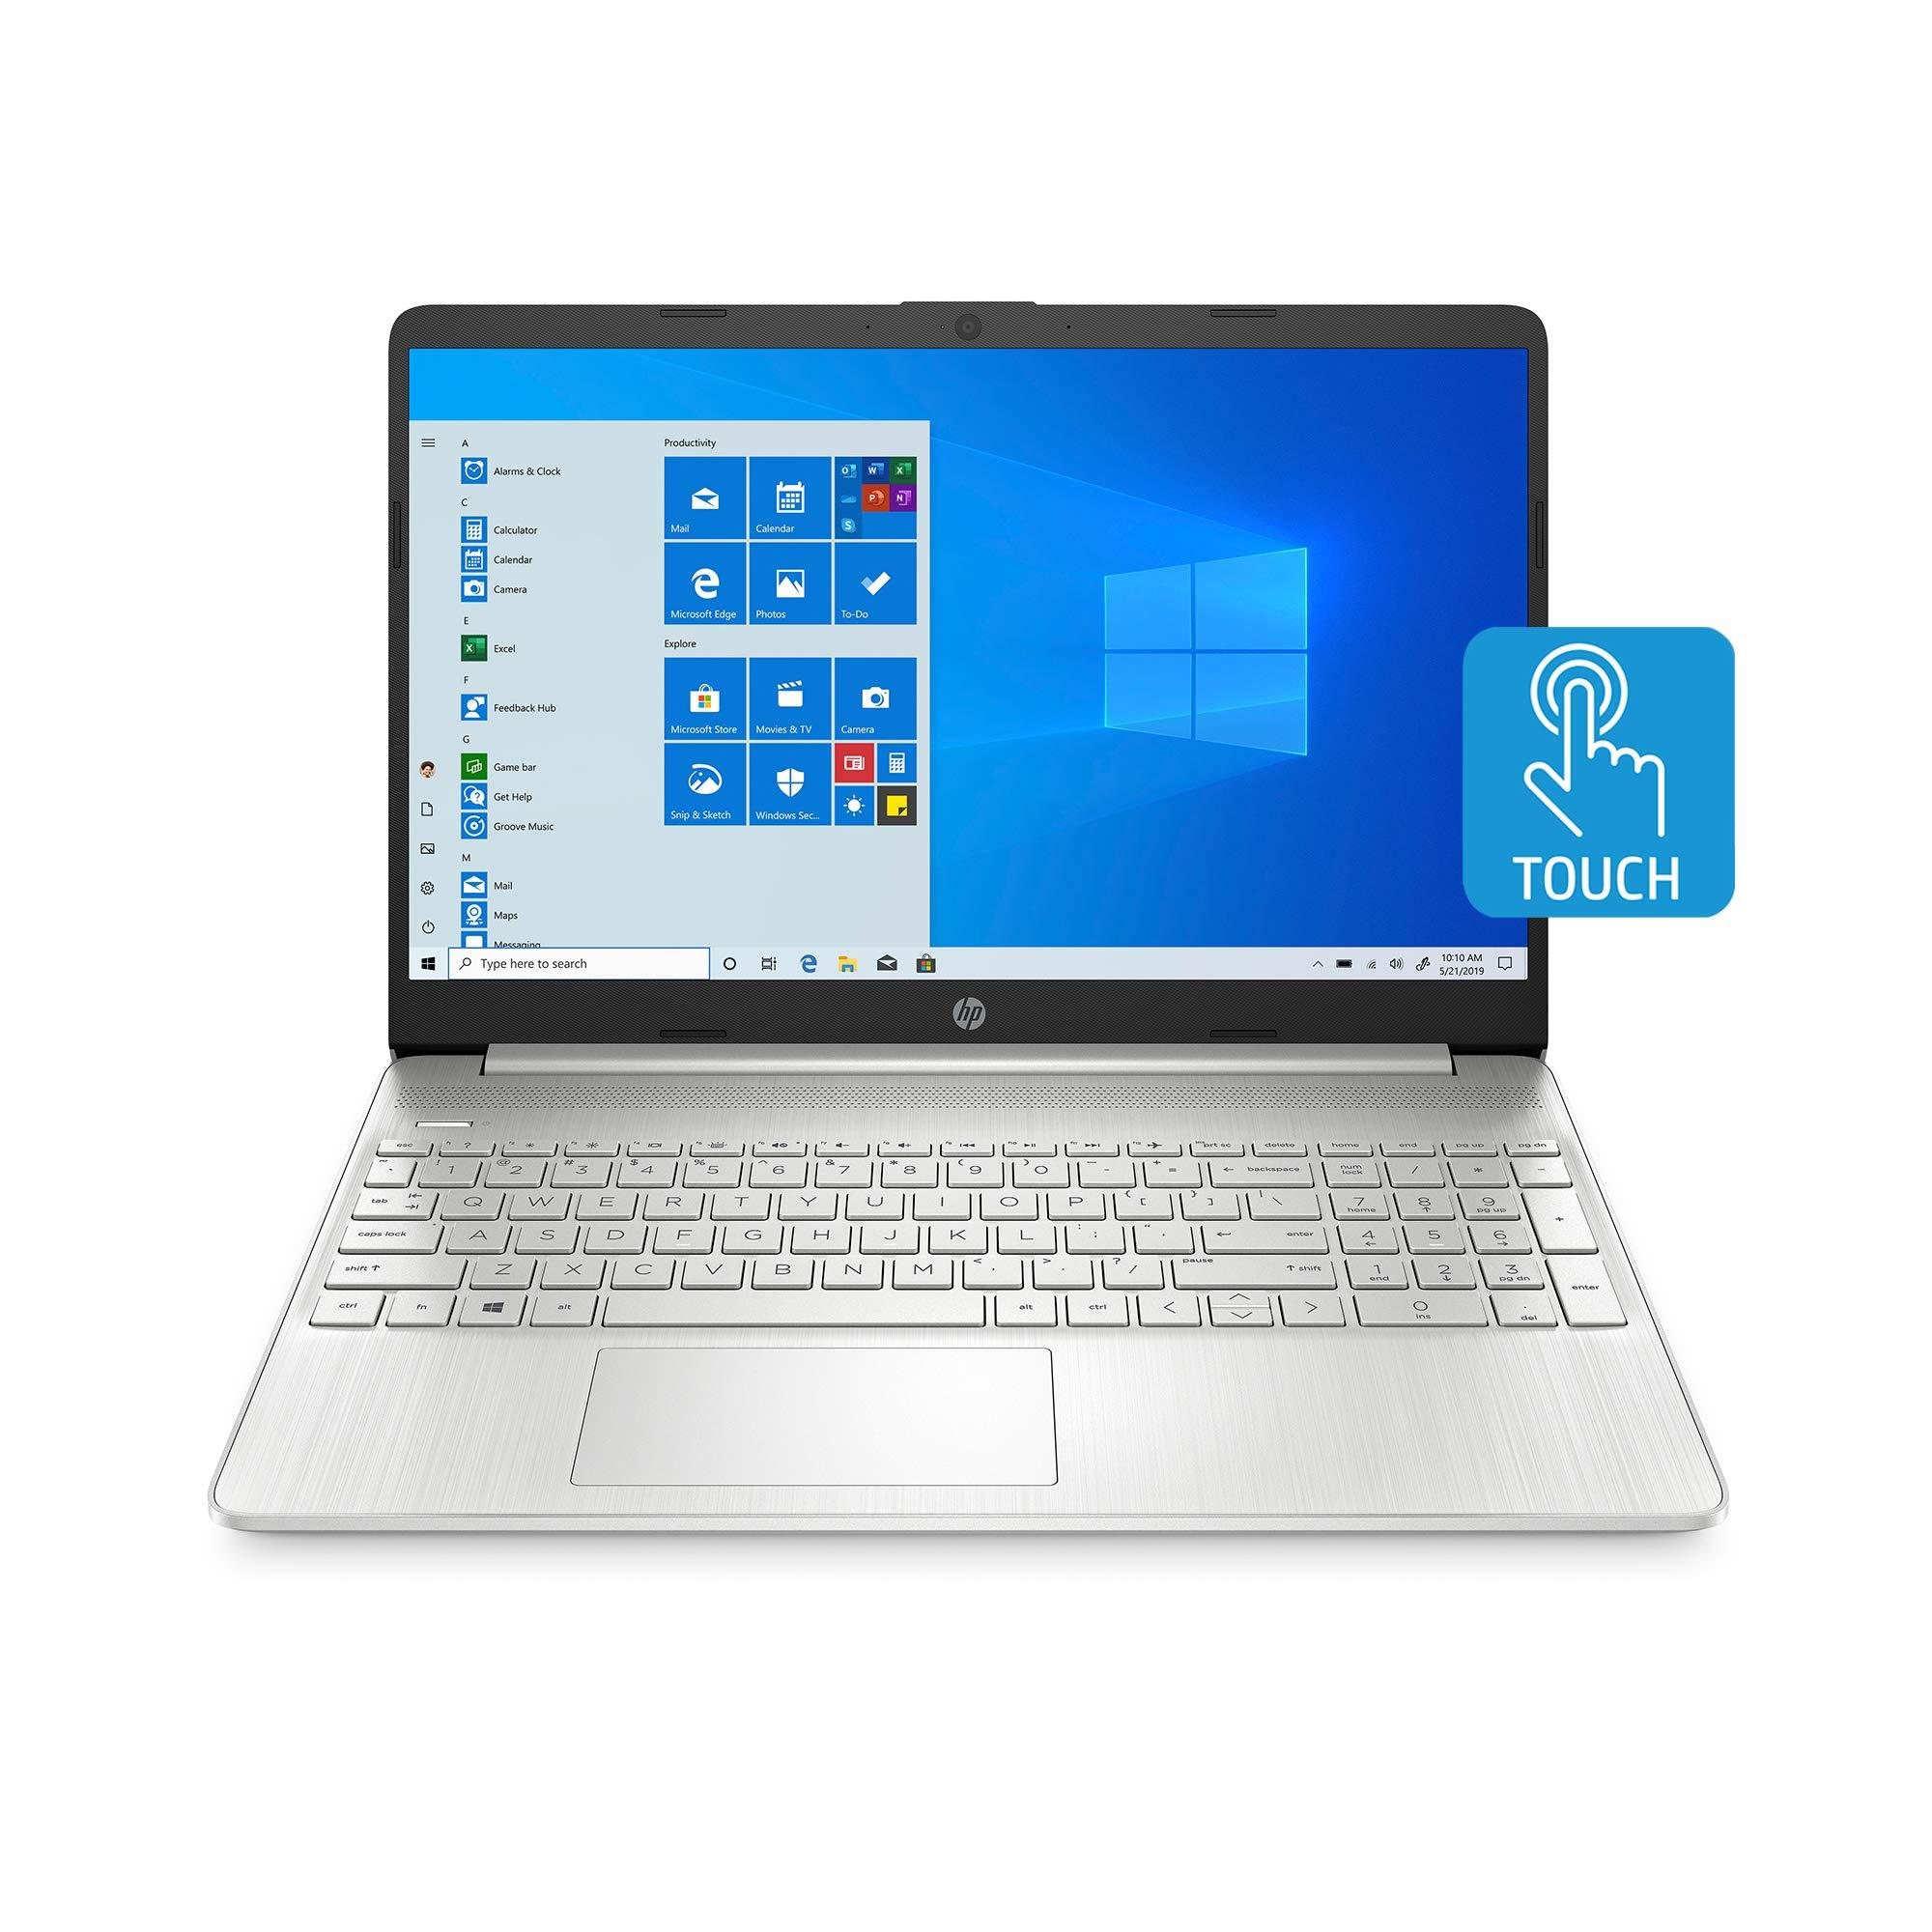 HP 15-inch Touchscreen Laptop, AMD Ryzen 3 3250U, 8 GB RAM, 256 GB SSD, Windows 10 Home in S Mode (15-ef1020nr, Natural Silver)